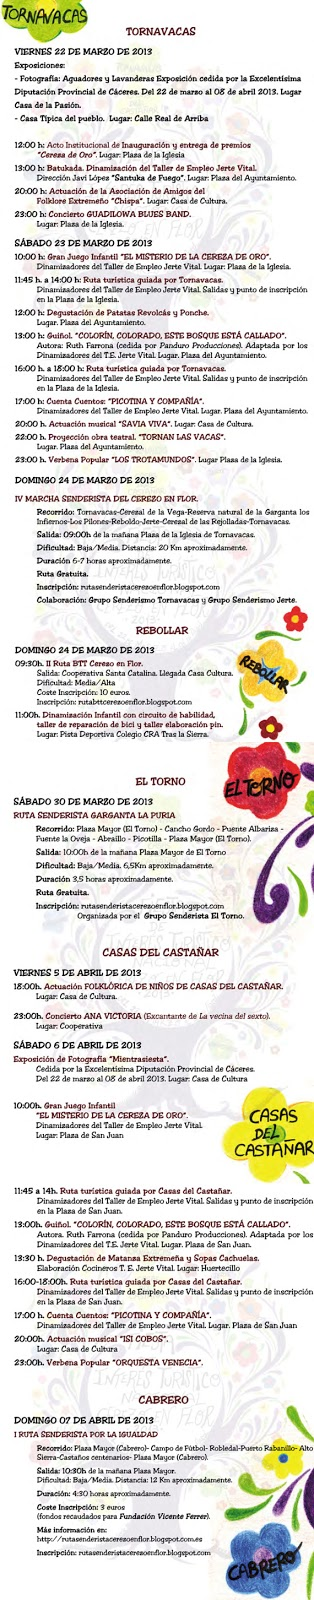 Programa Cerezo en Flor 2013